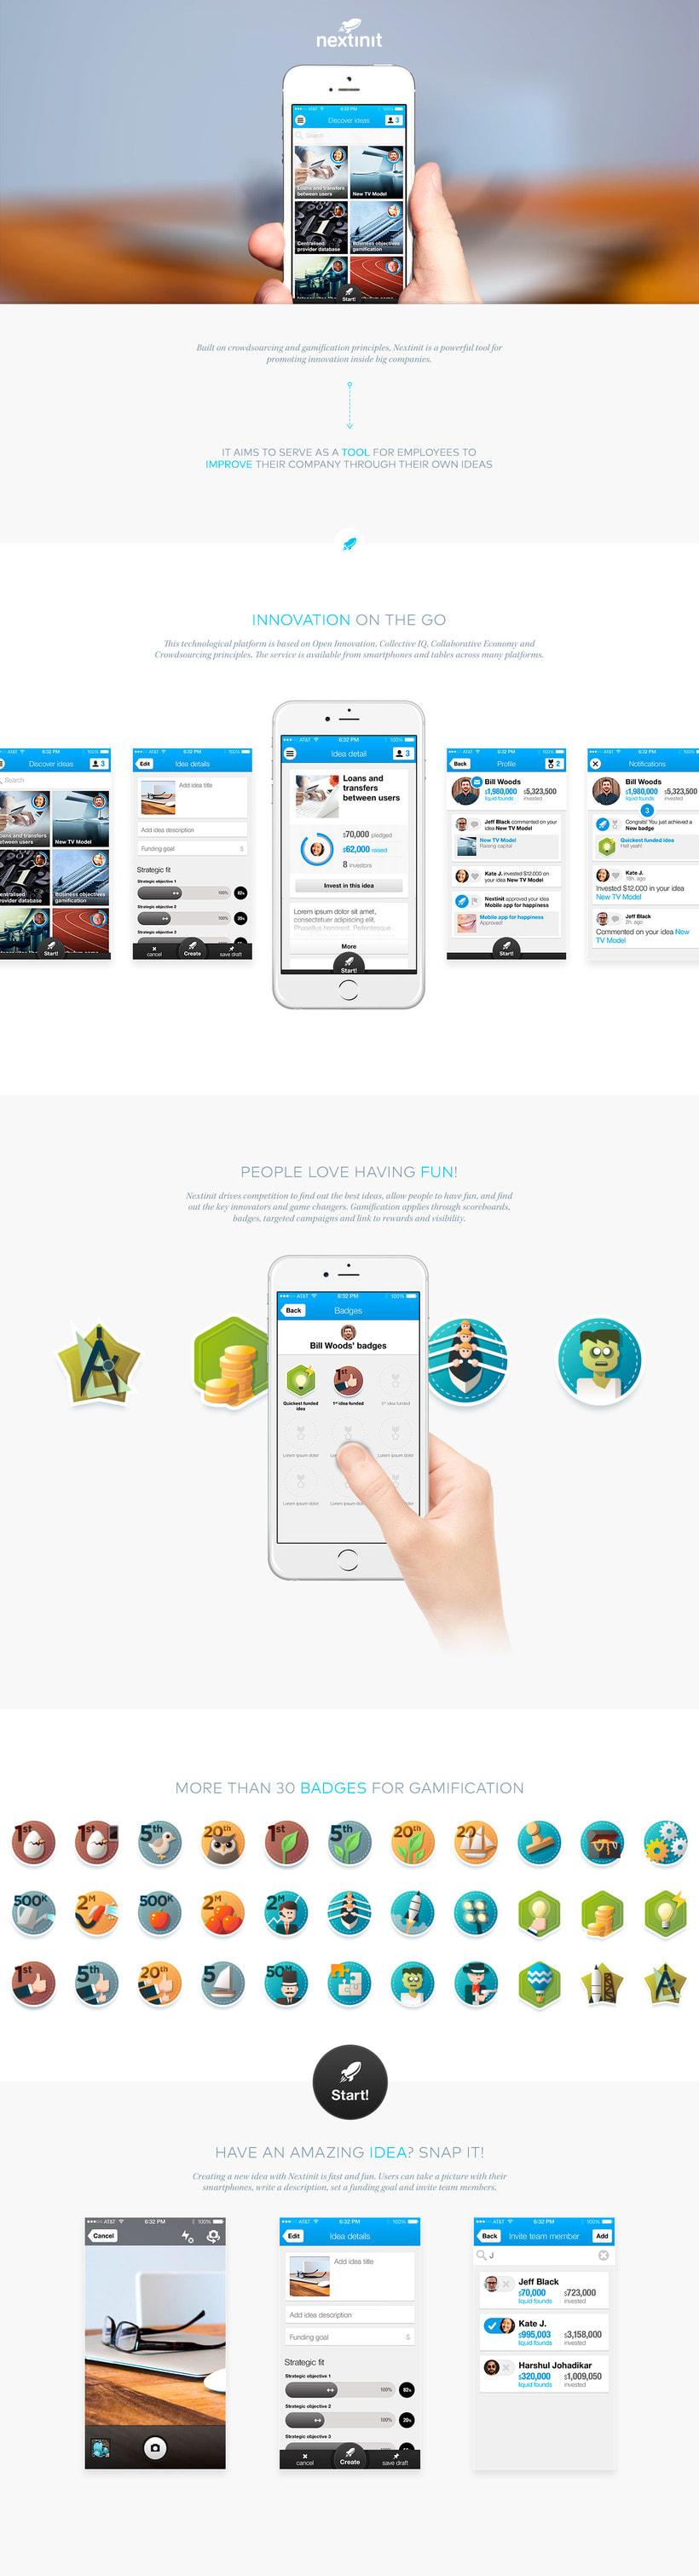 Nextinit Mobile App 0